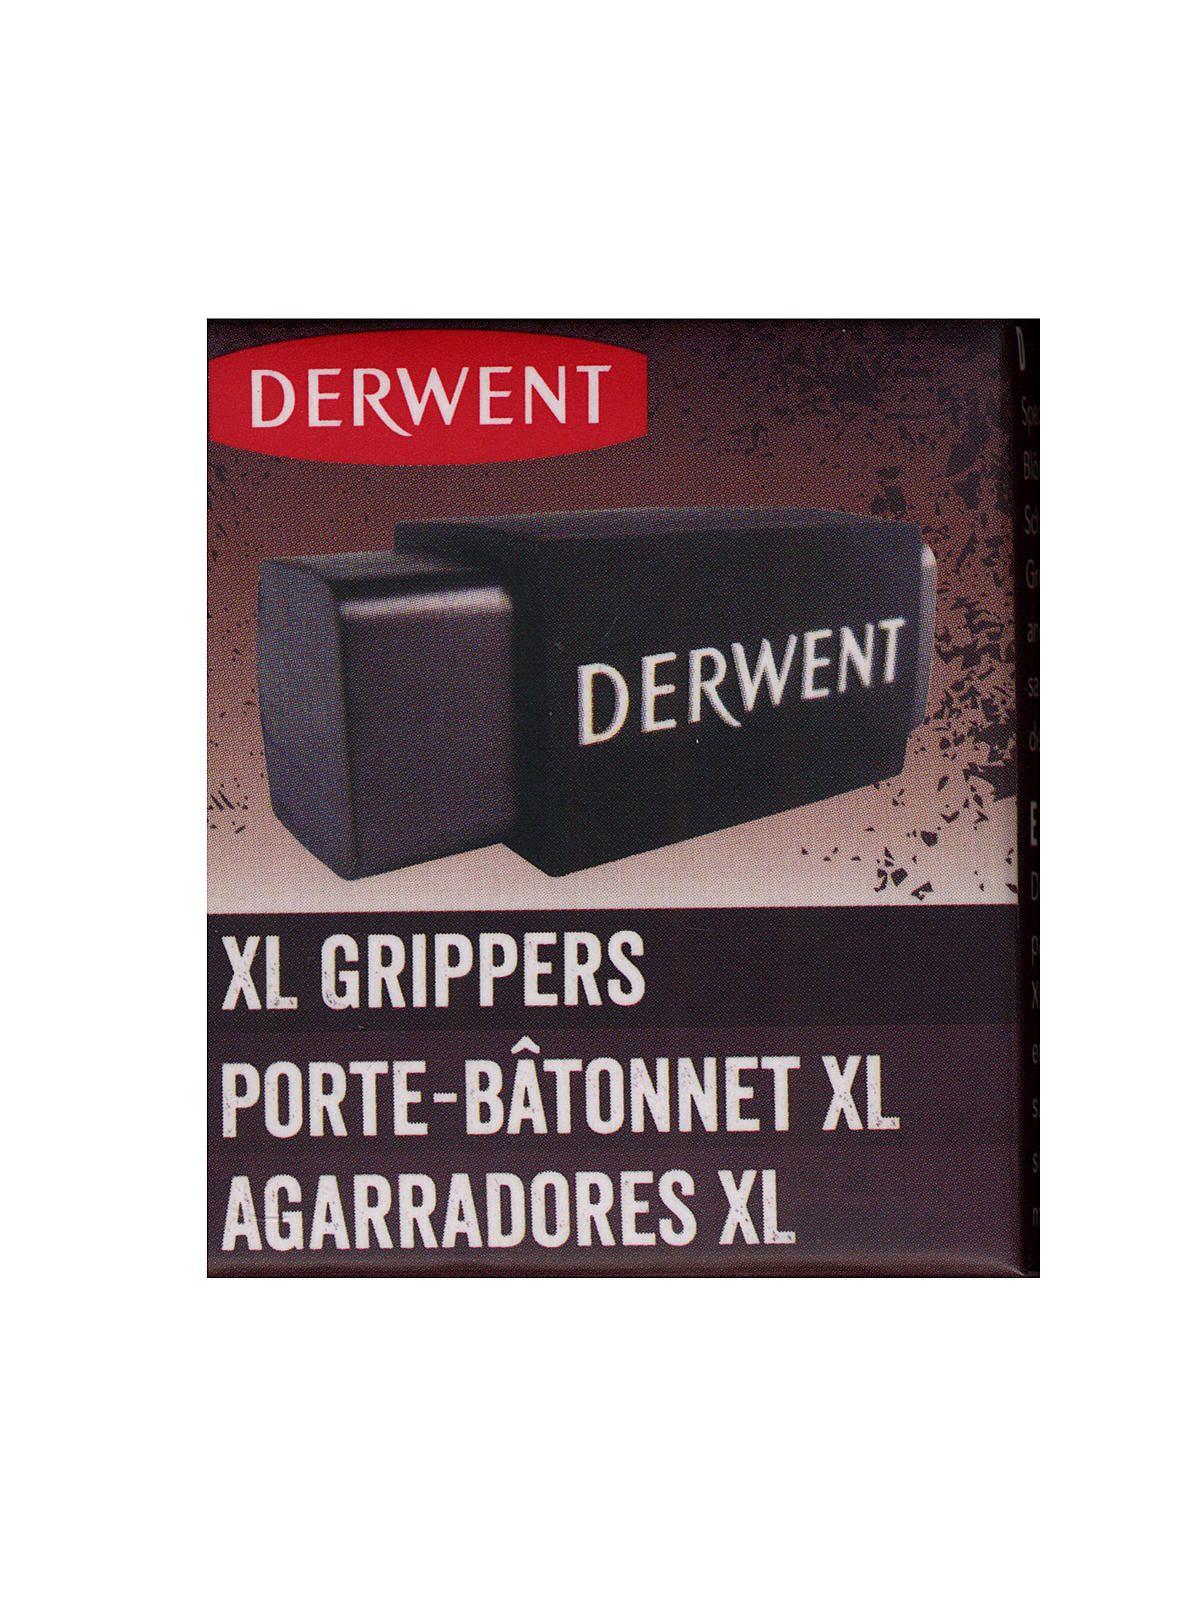 Derwent Xl Charcoal And Graphite Block Accessories Sponsored Arts Discount Illustration Crafts Craft Ad